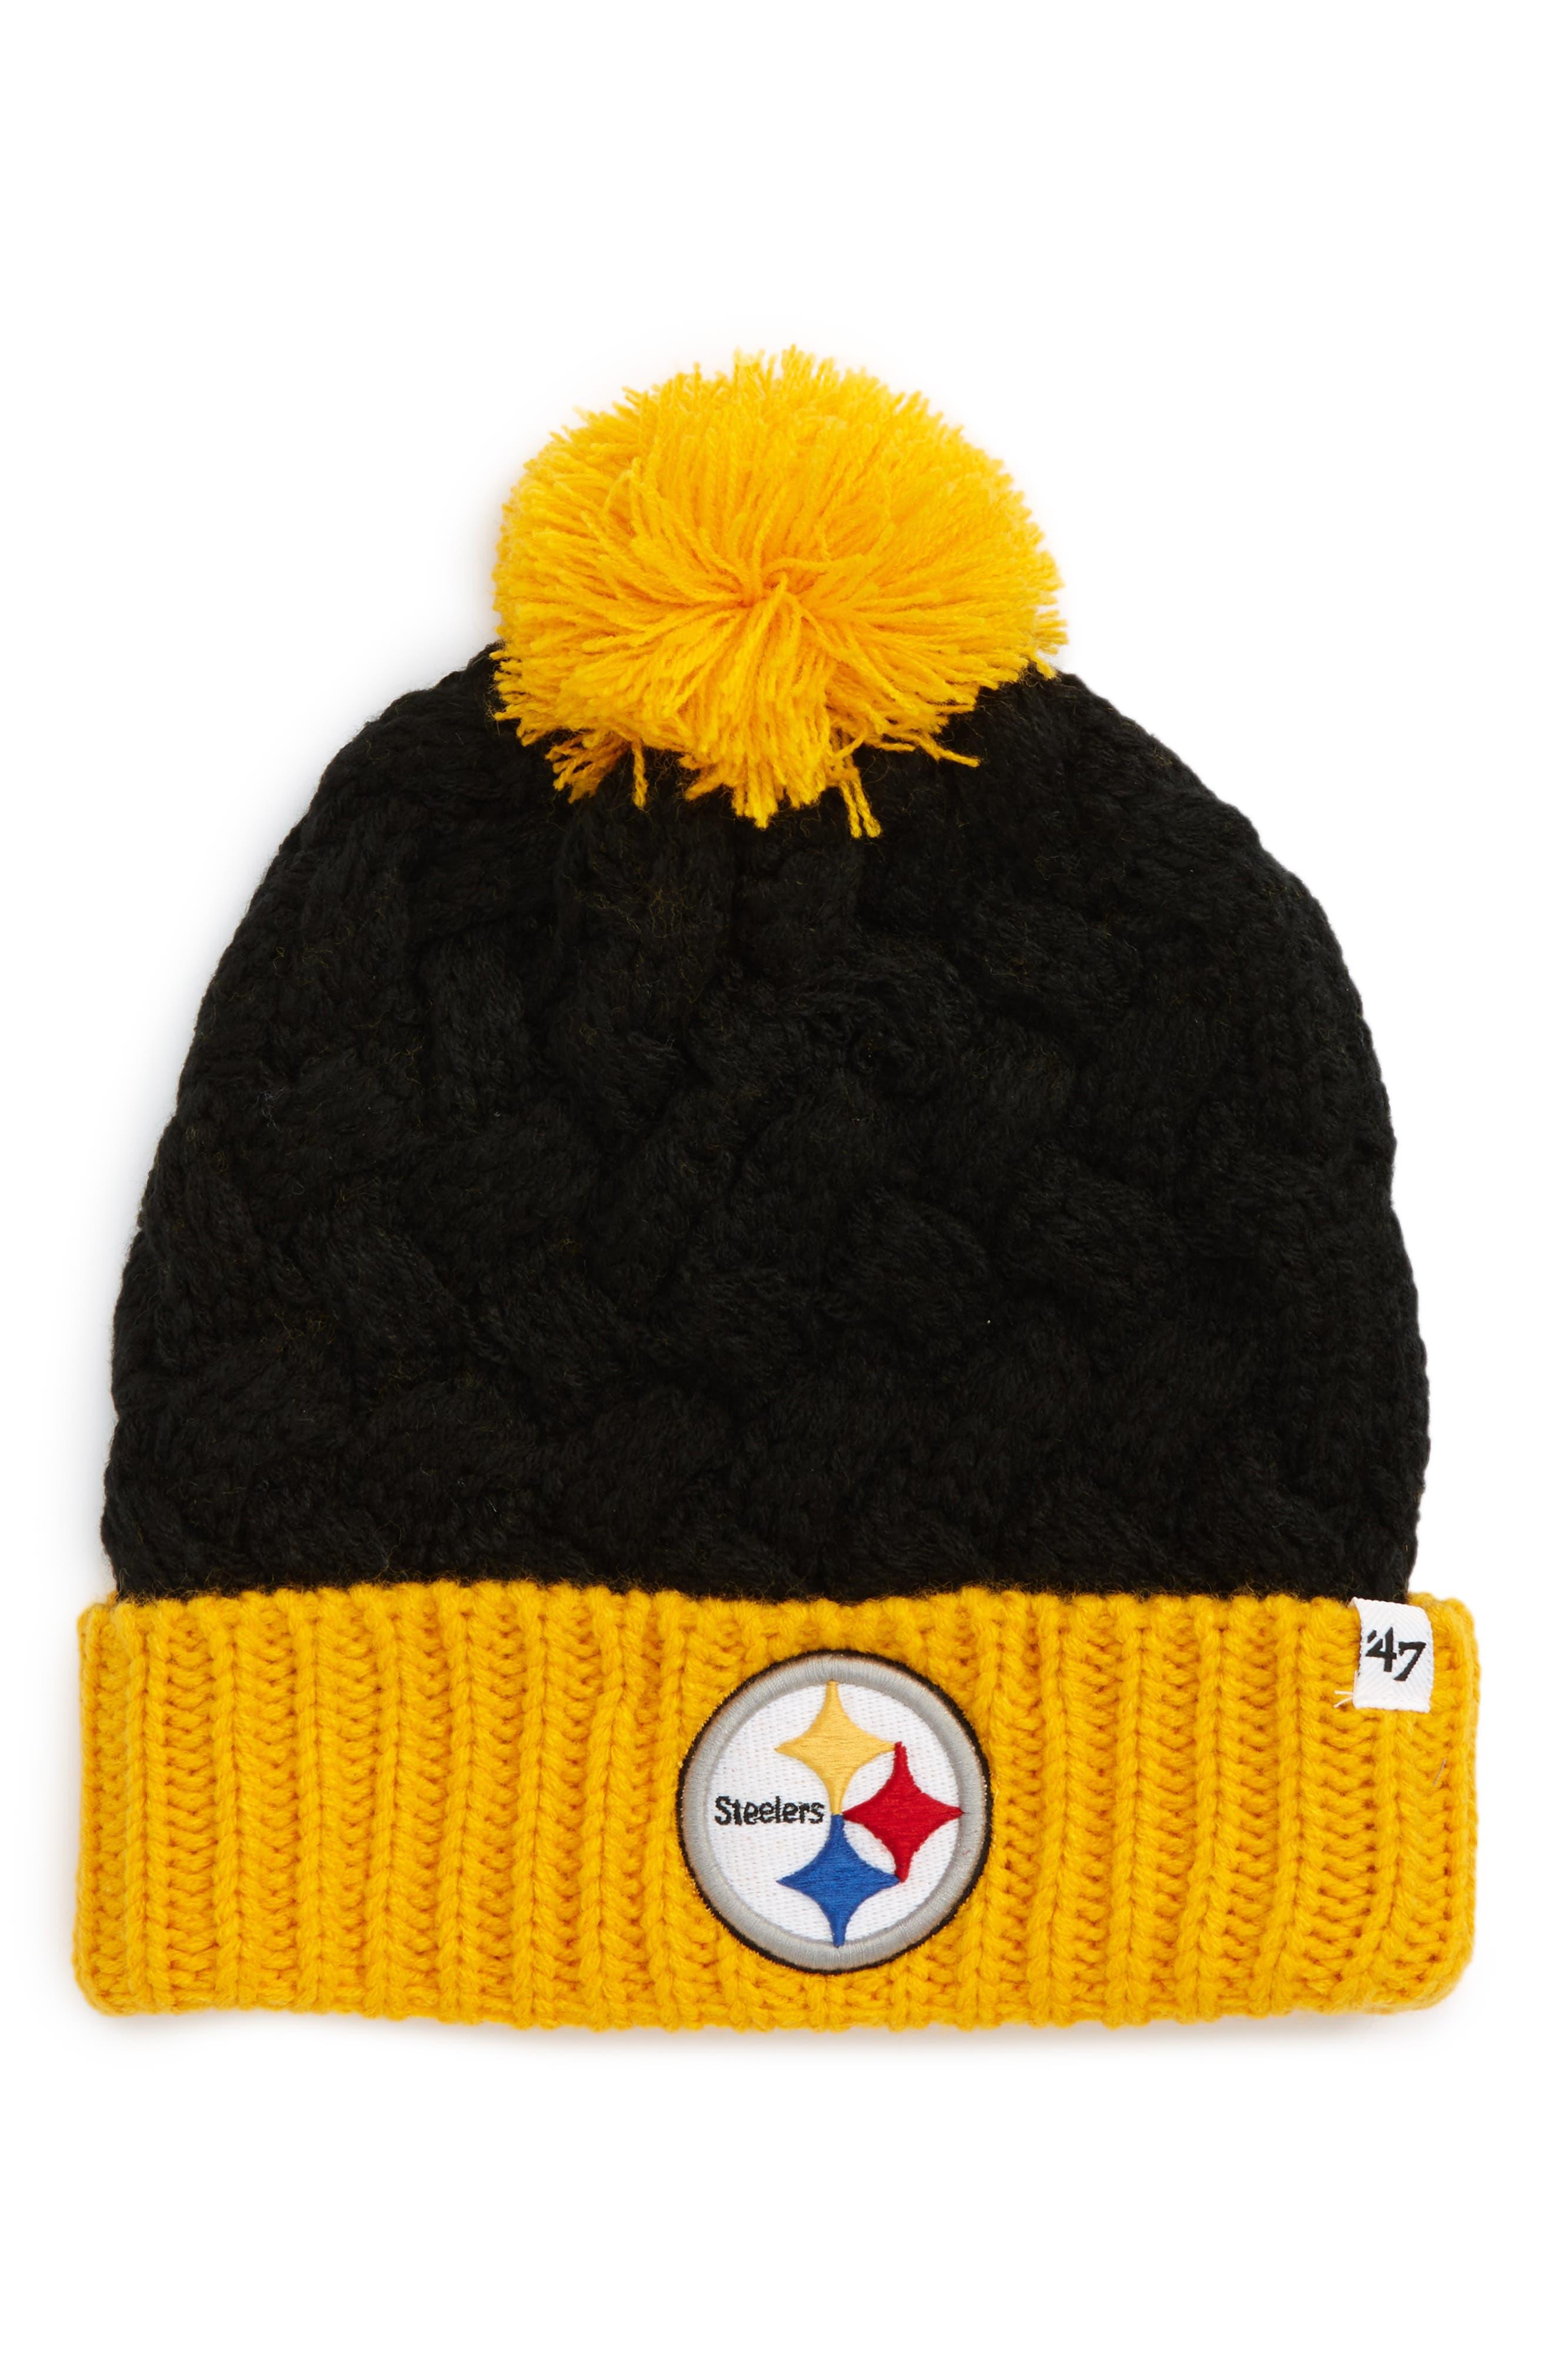 Matterhorn Pittsburgh Steelers Beanie,                             Main thumbnail 1, color,                             001